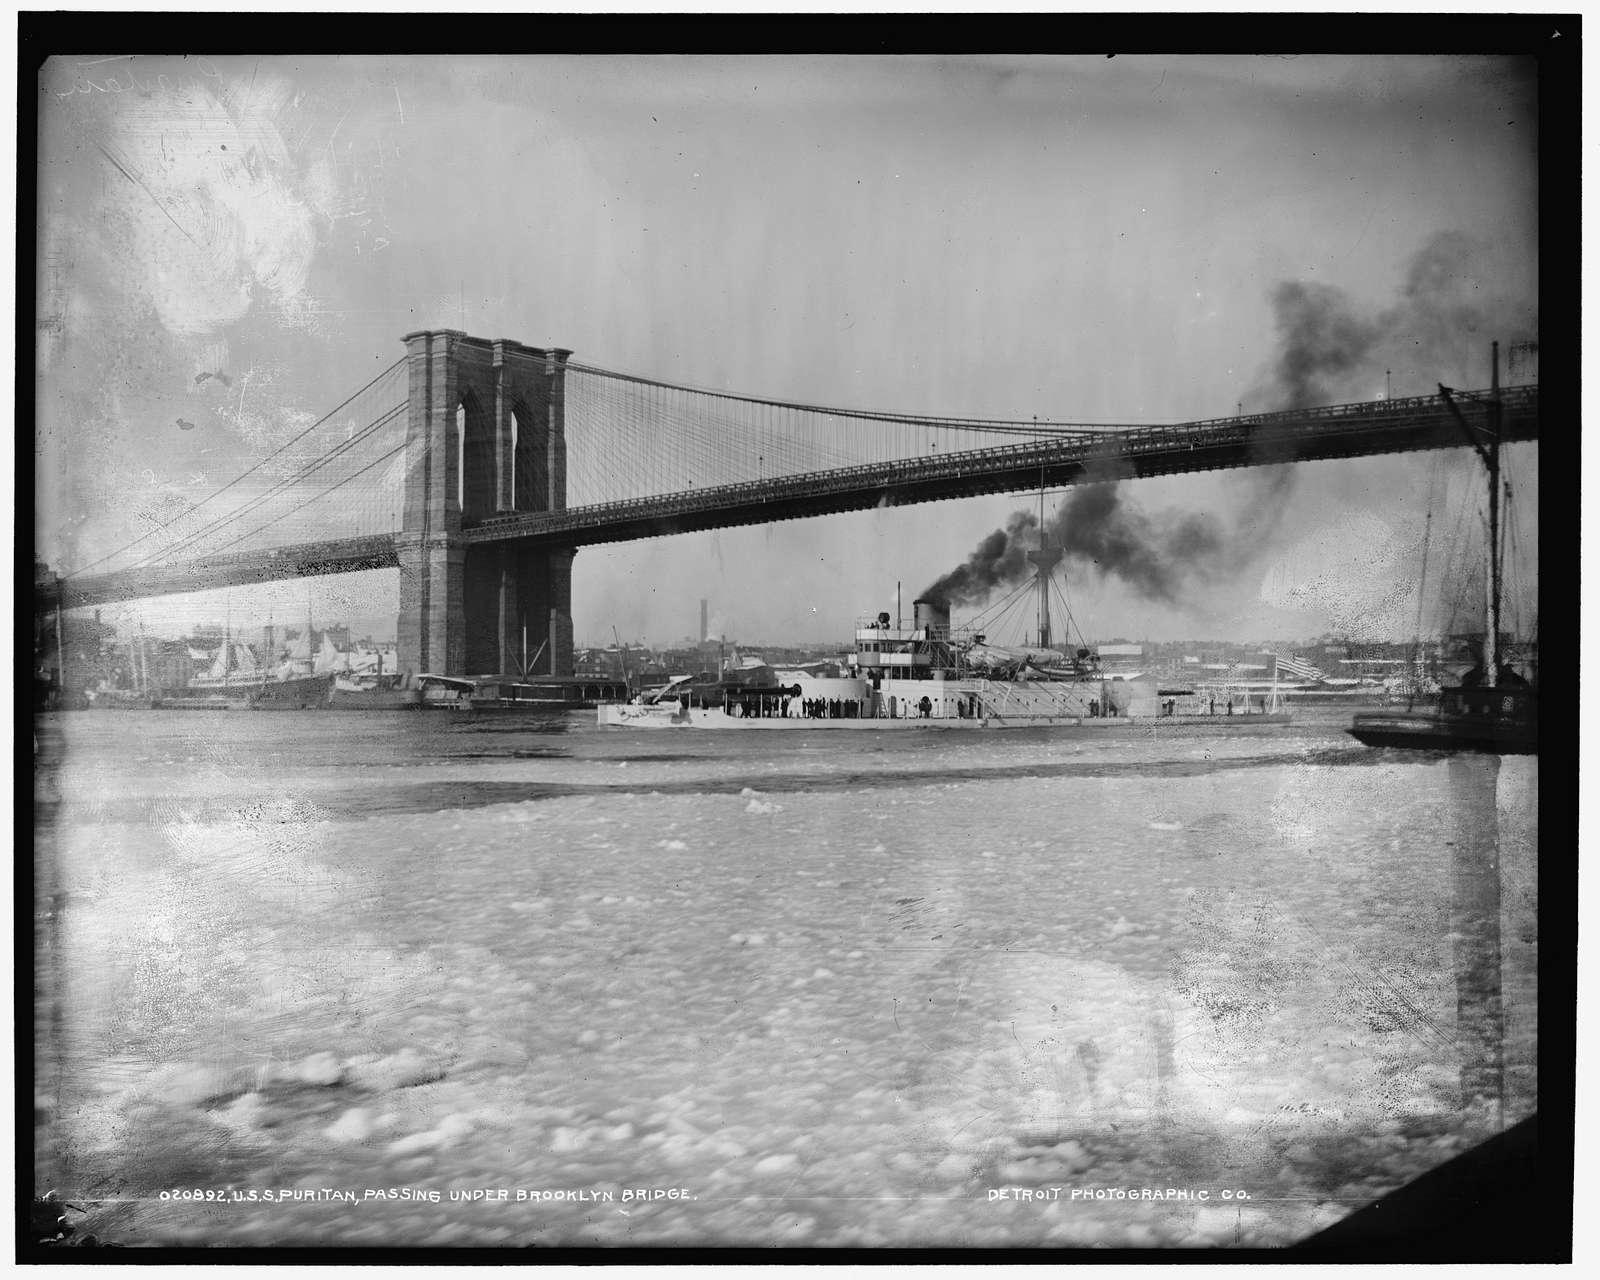 U.S.S. Puritan passing under Brooklyn Bridge